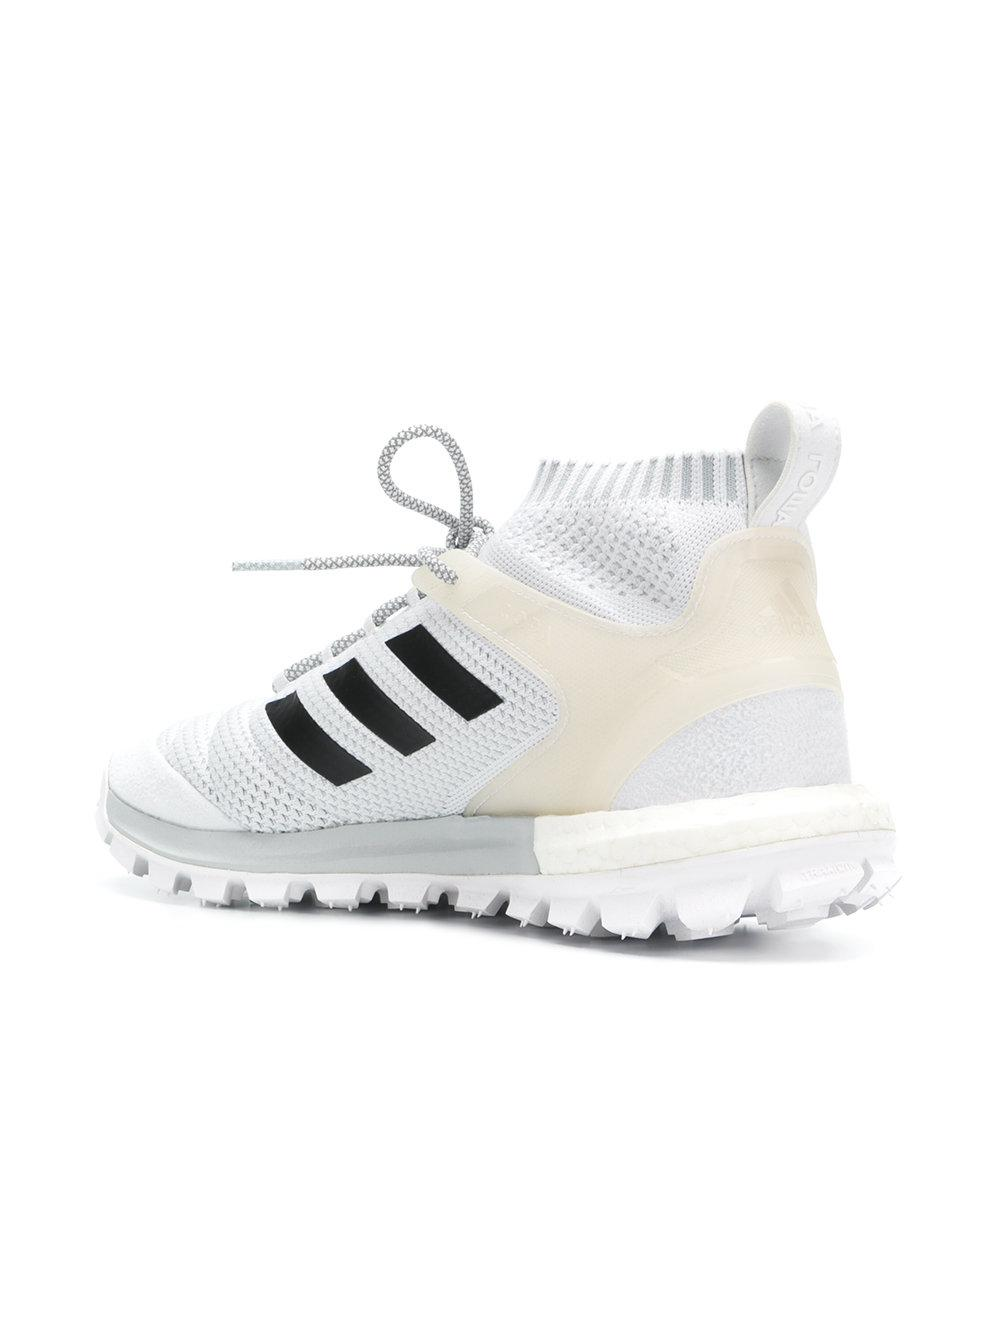 buy popular ae36f b438f Gosha Rubchinskiy - White X Adidas Copa Primeknit Sneaker - Lyst. View  fullscreen